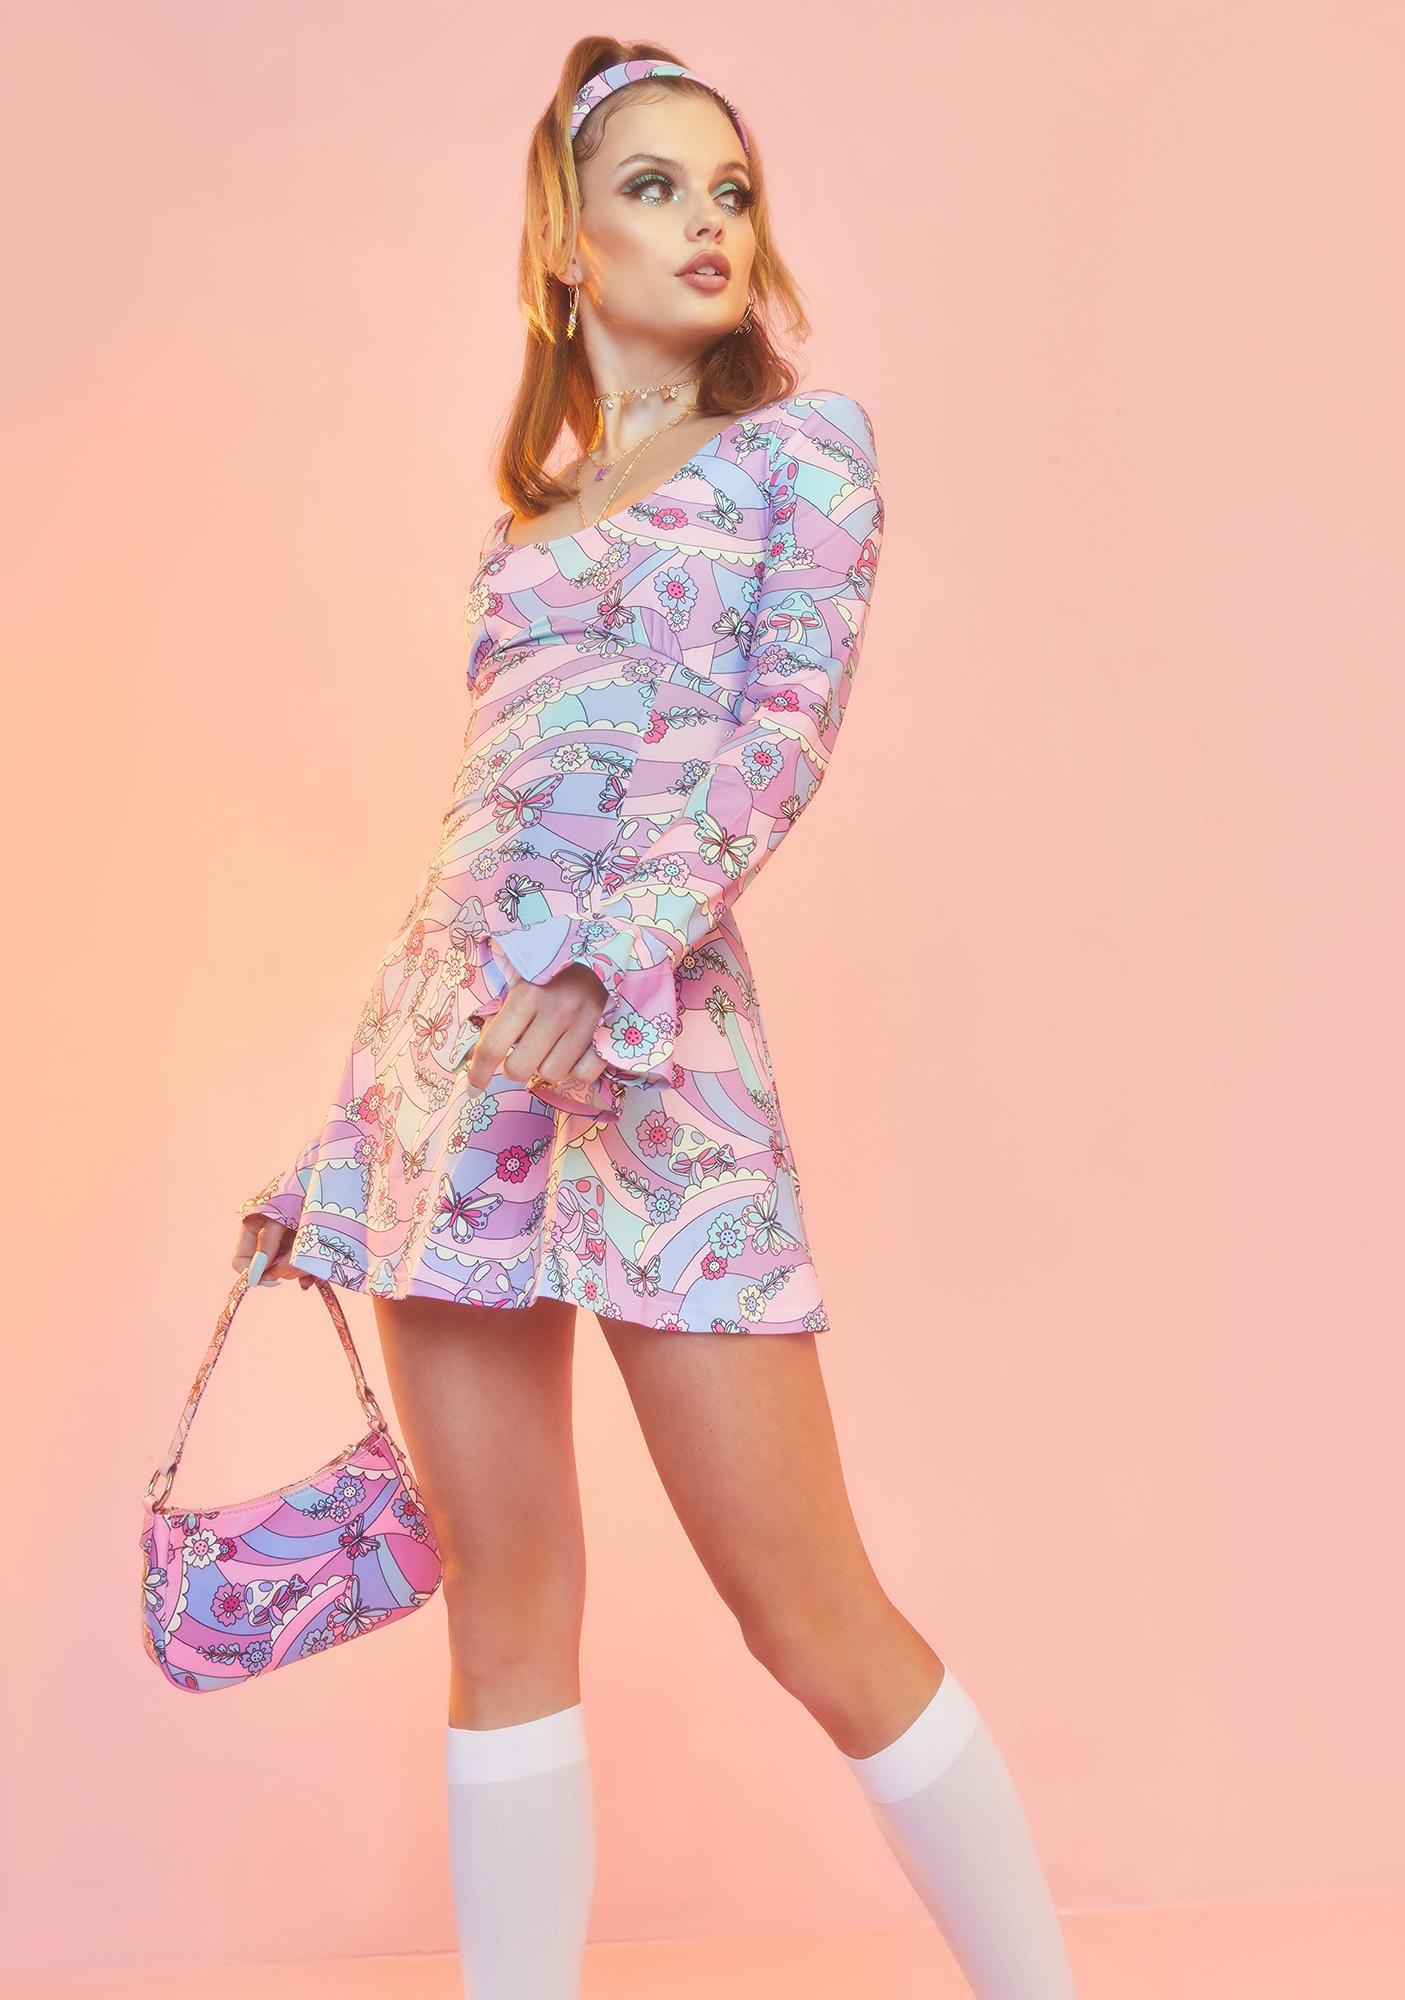 Sugar Thrillz Blooming With Love Mini Dress